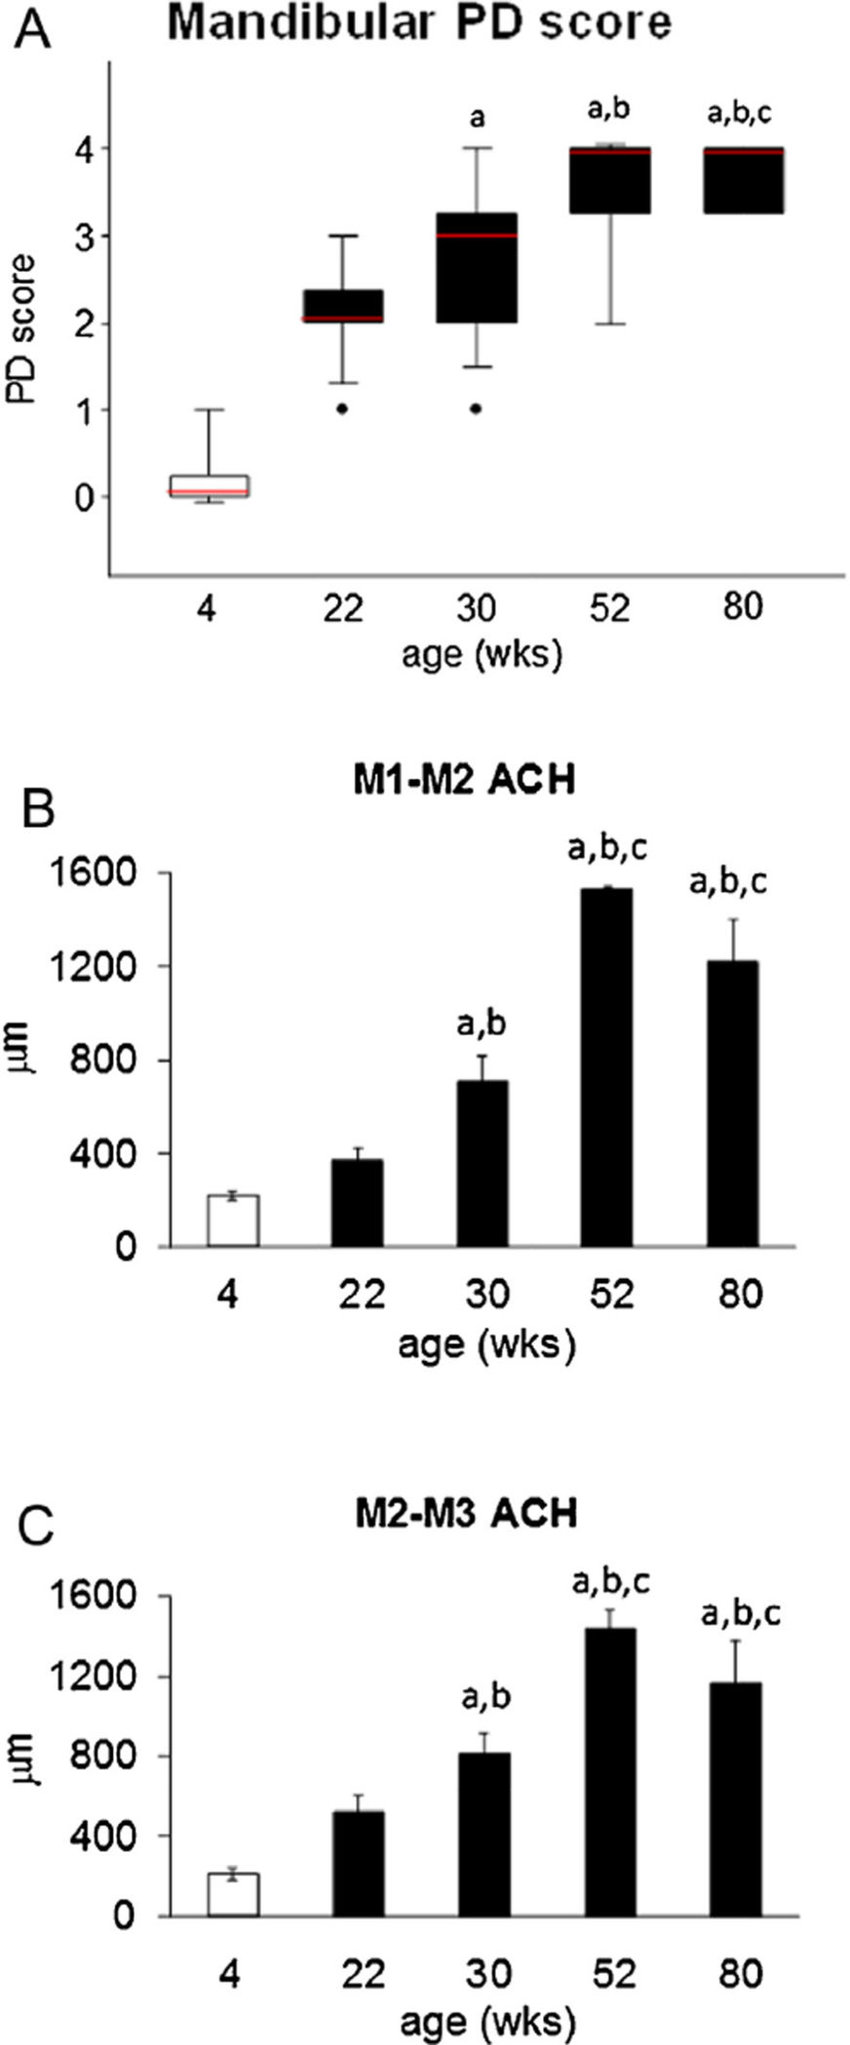 Periodontitis (PD) Score and histometric Alveolar Crest